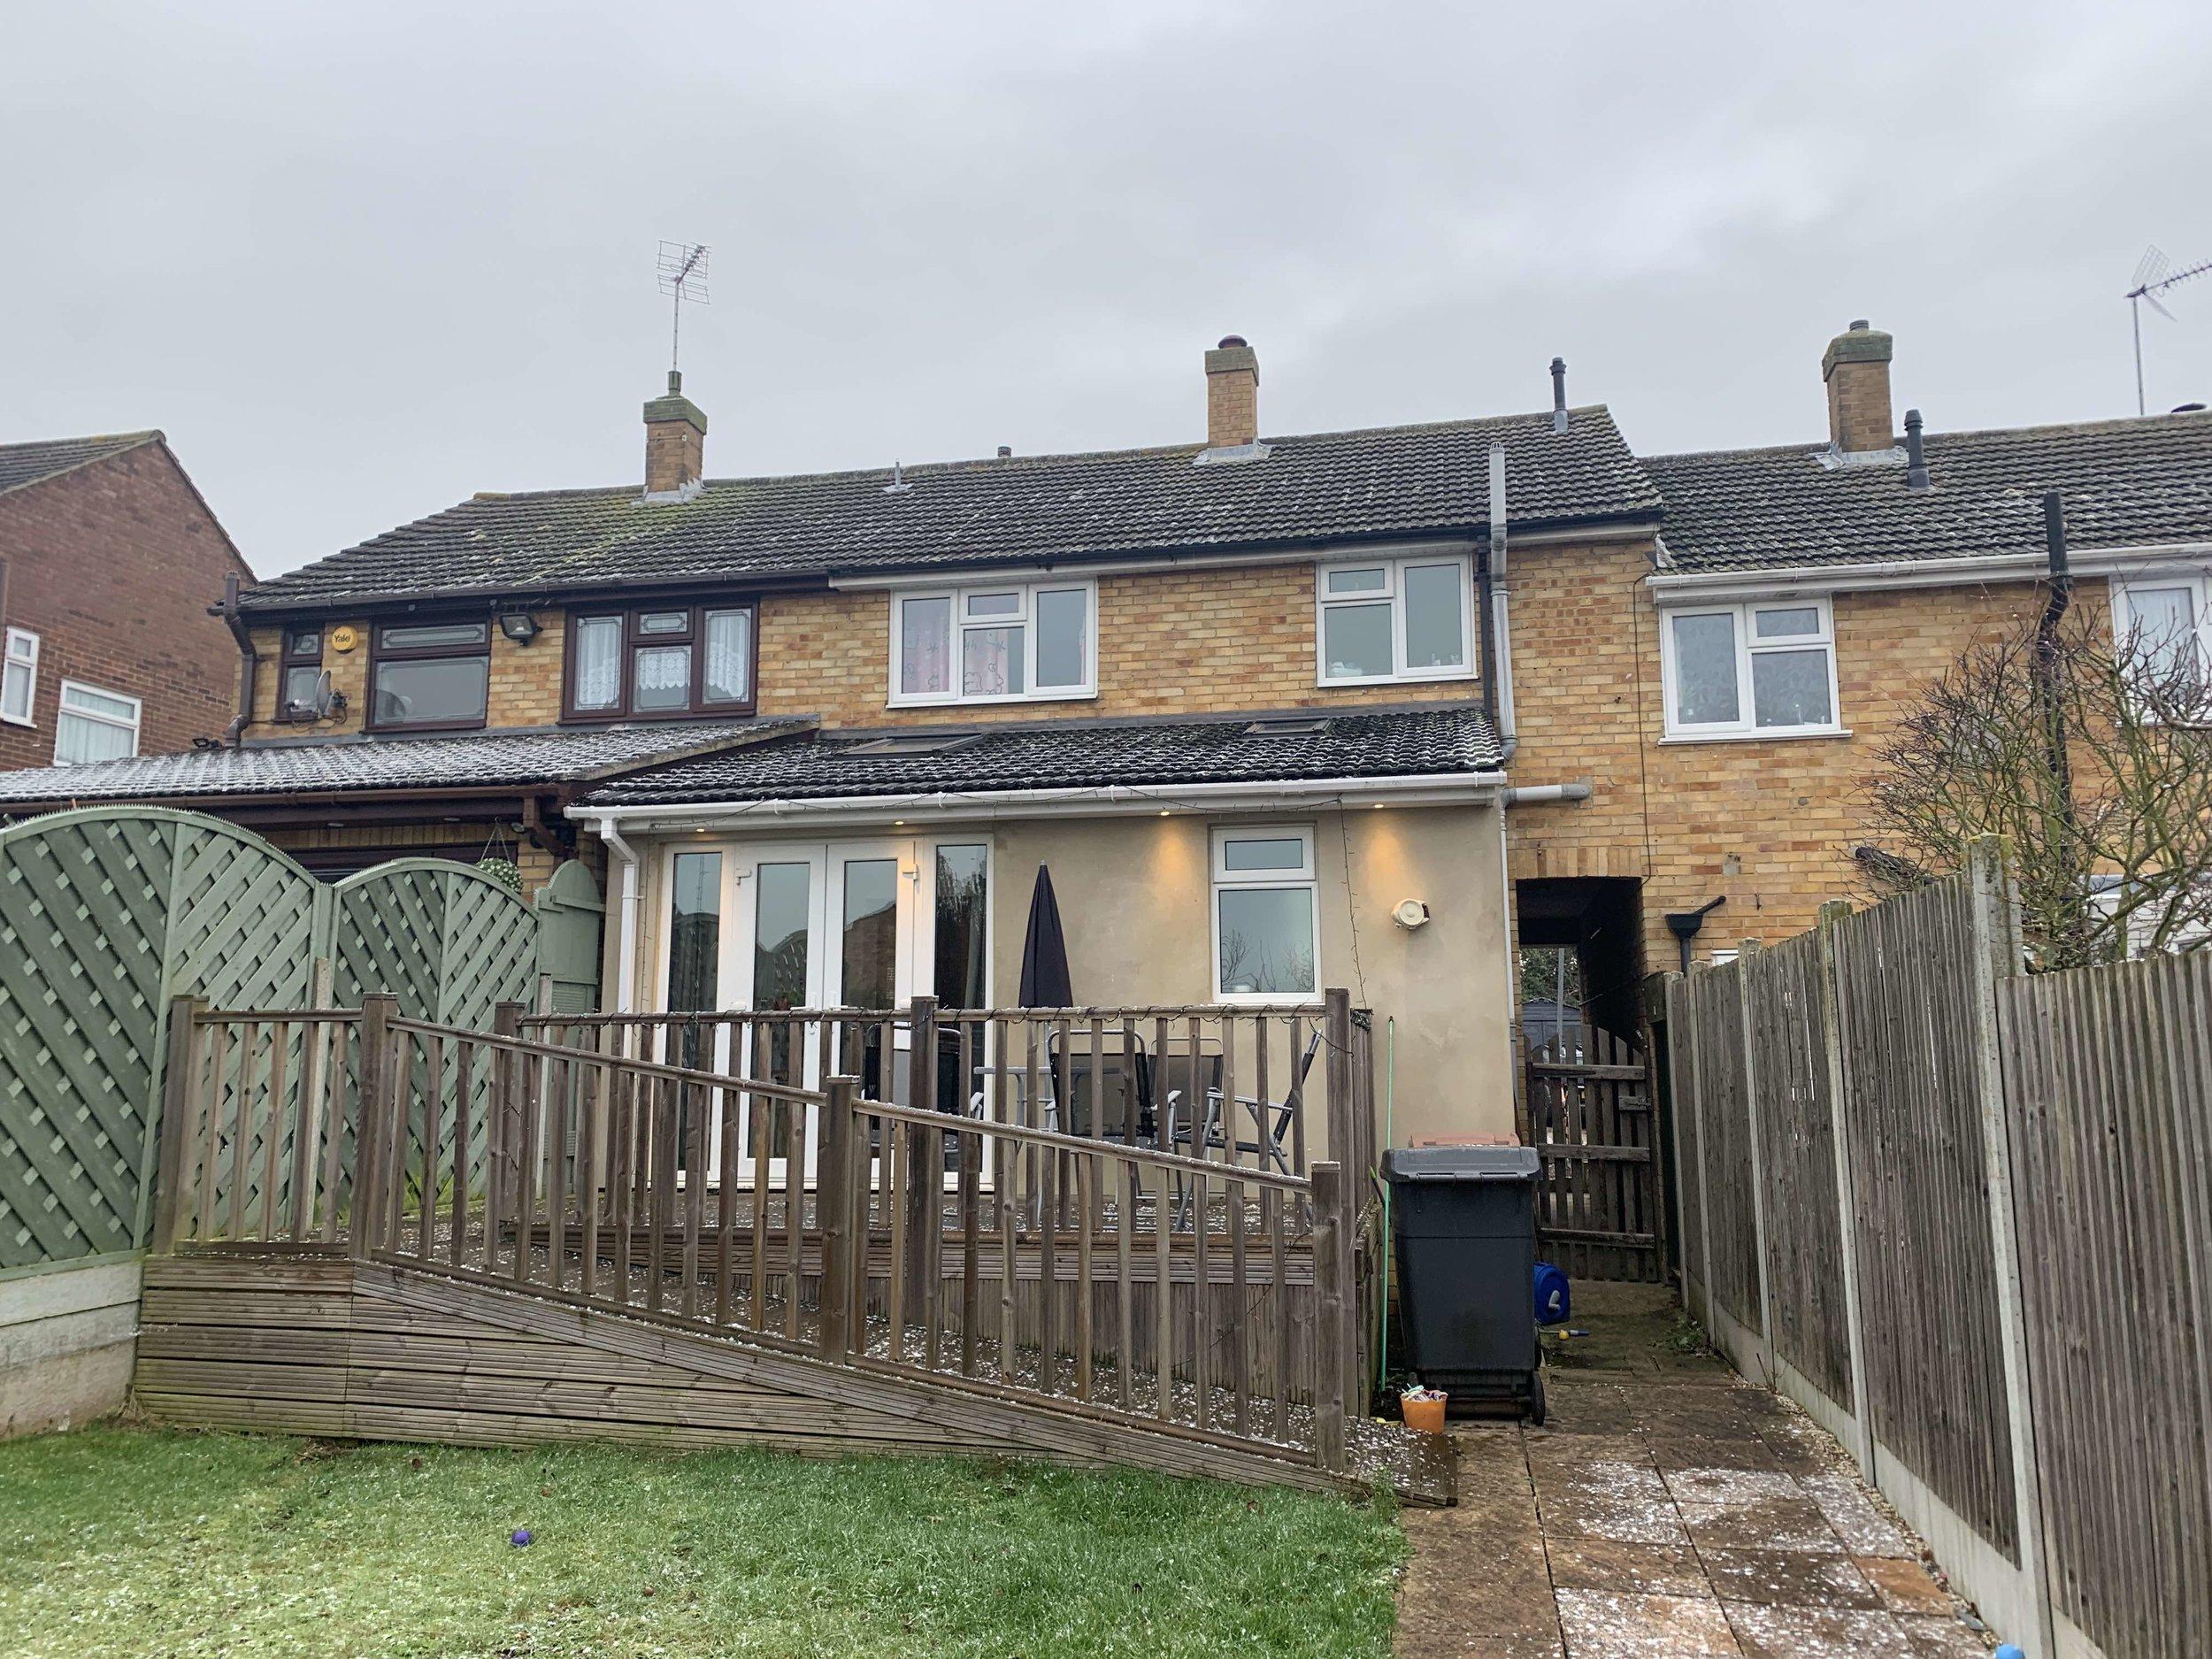 Chelmsford house rear